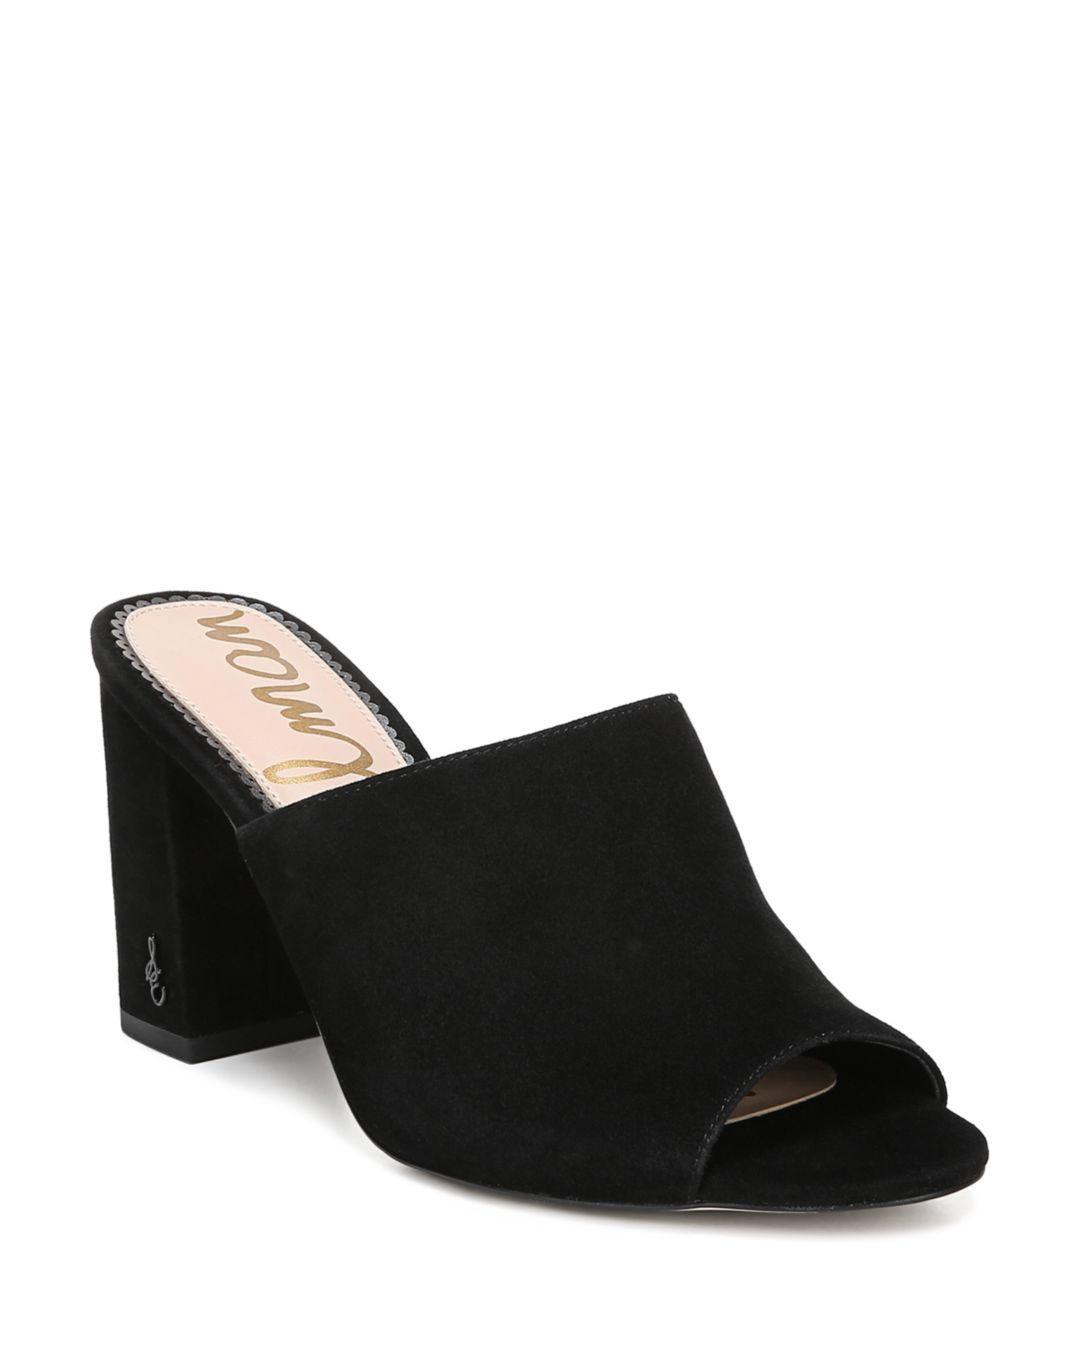 8cf72ec5d04 Lyst - Sam Edelman Women s Orlie Open-toe Block-heel Mules in Black